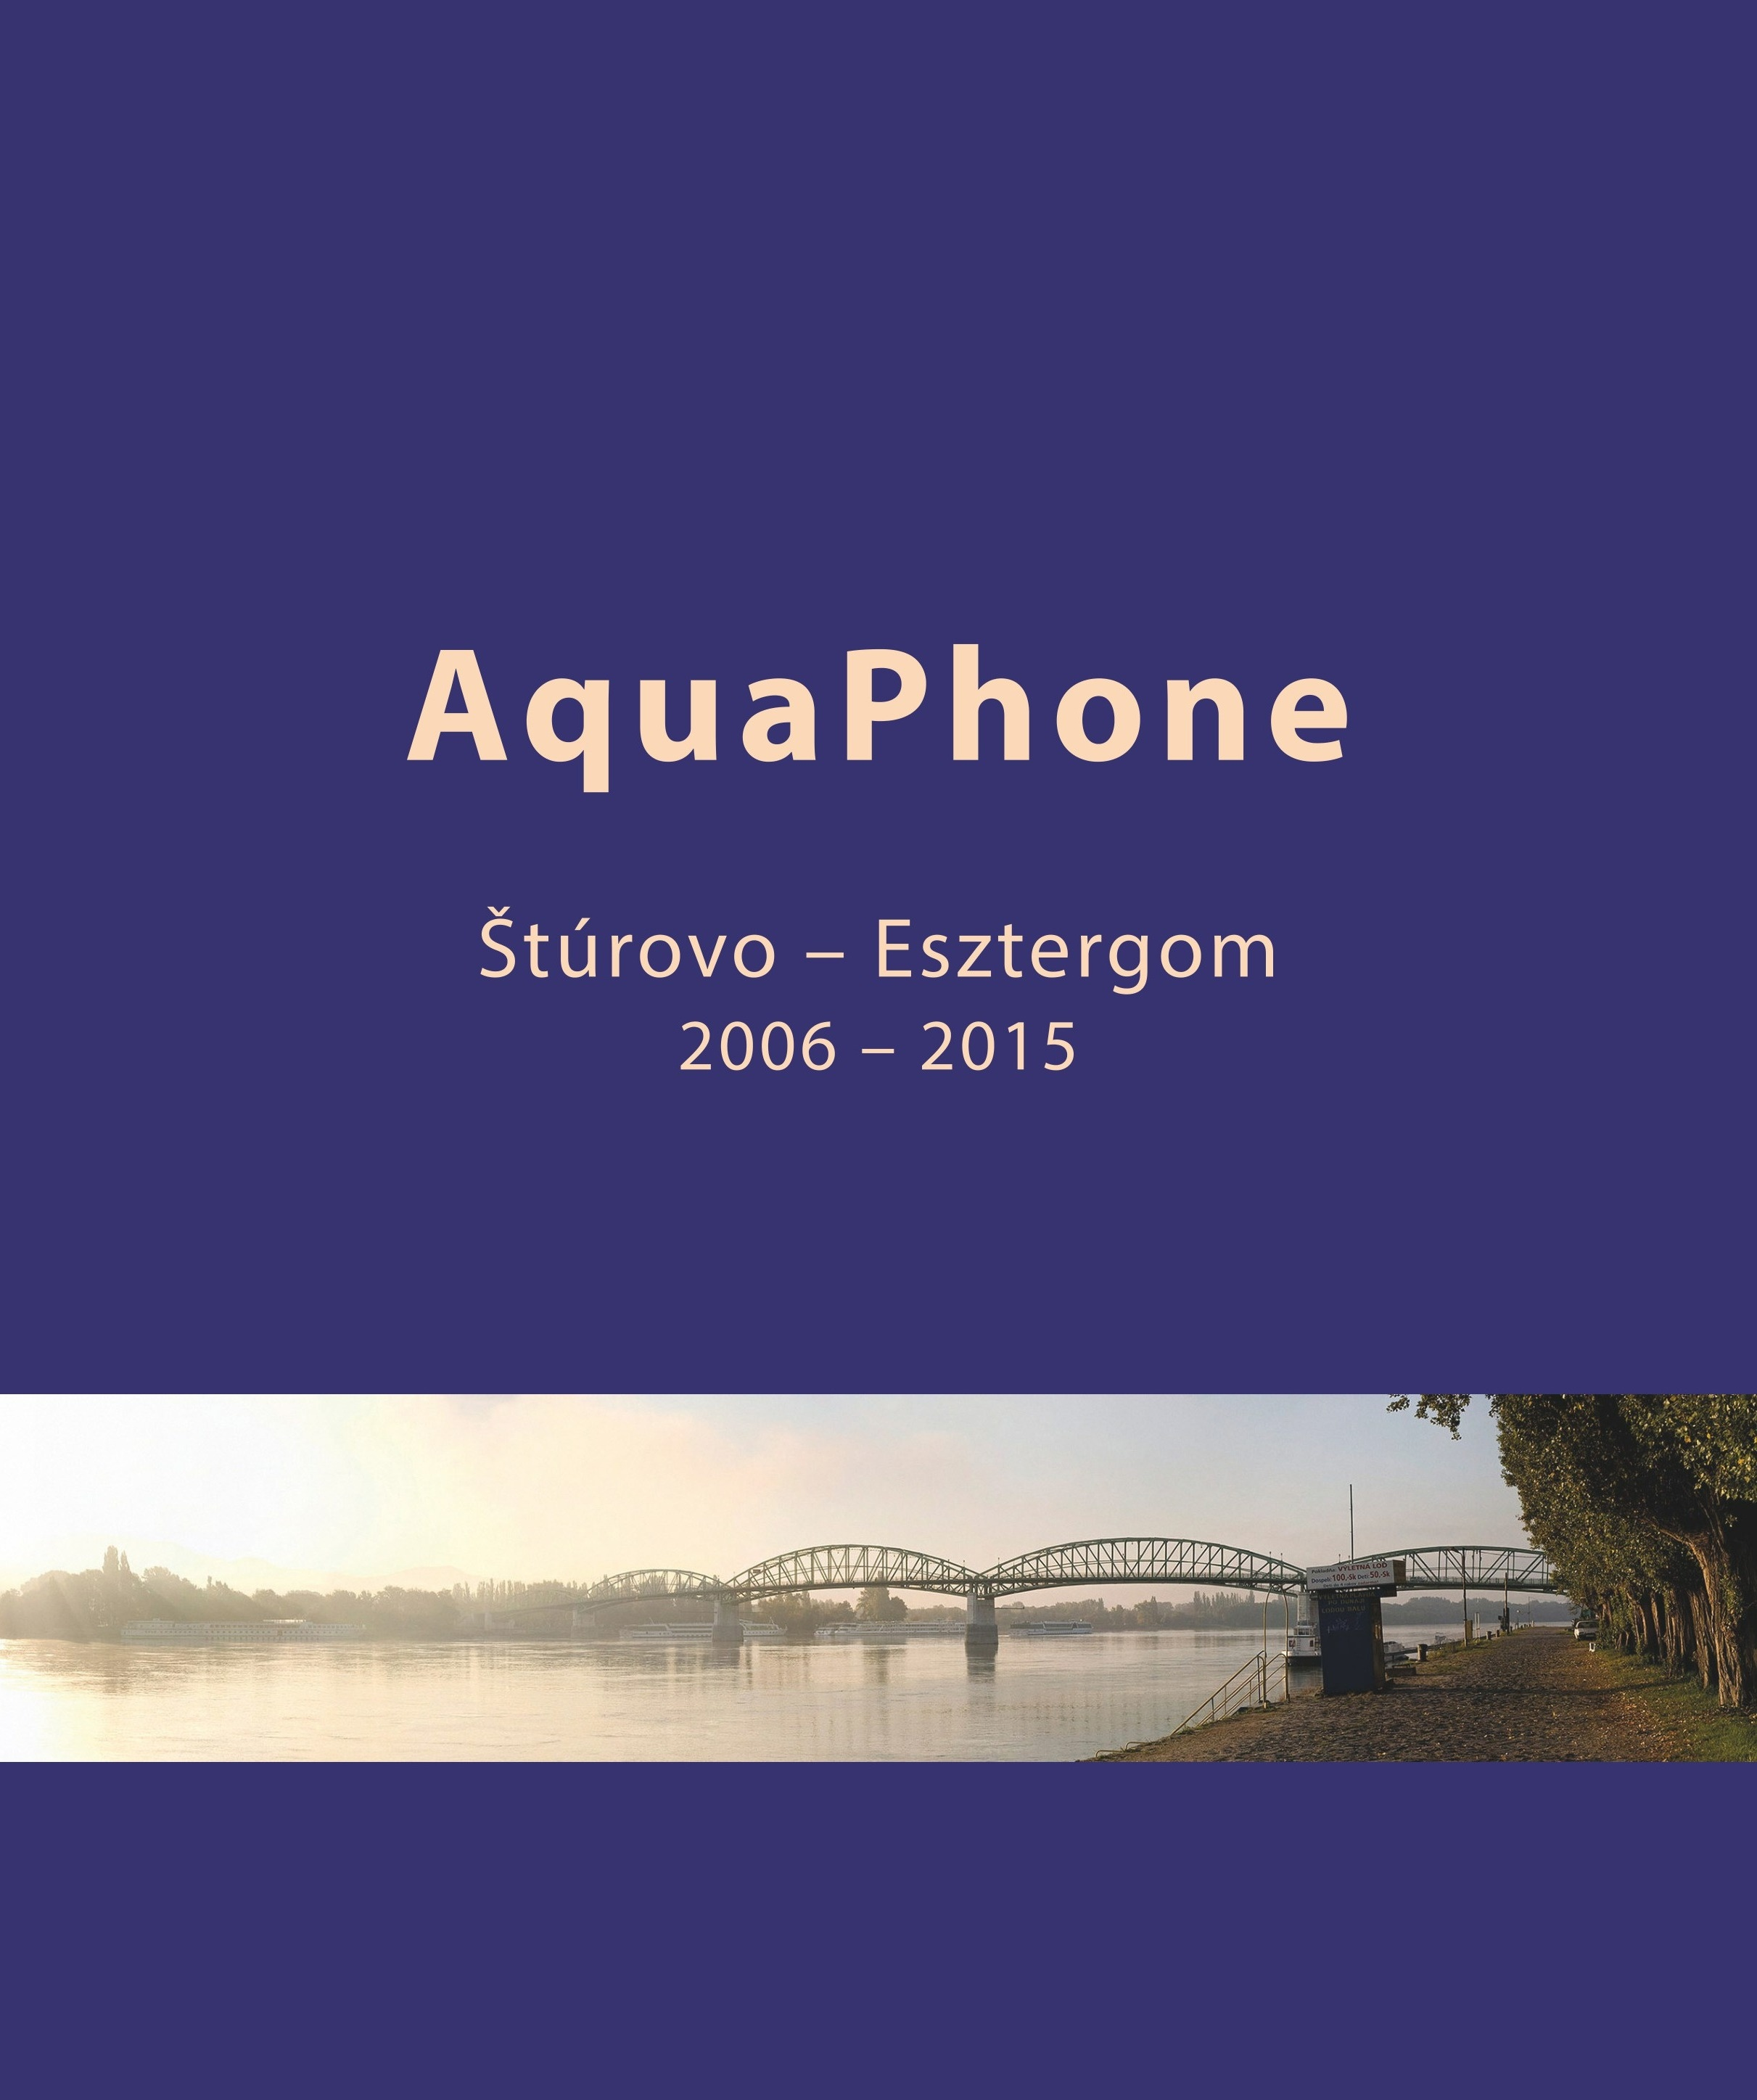 AquaPhone - Štúrovo - Esztergom 2006 - 2015